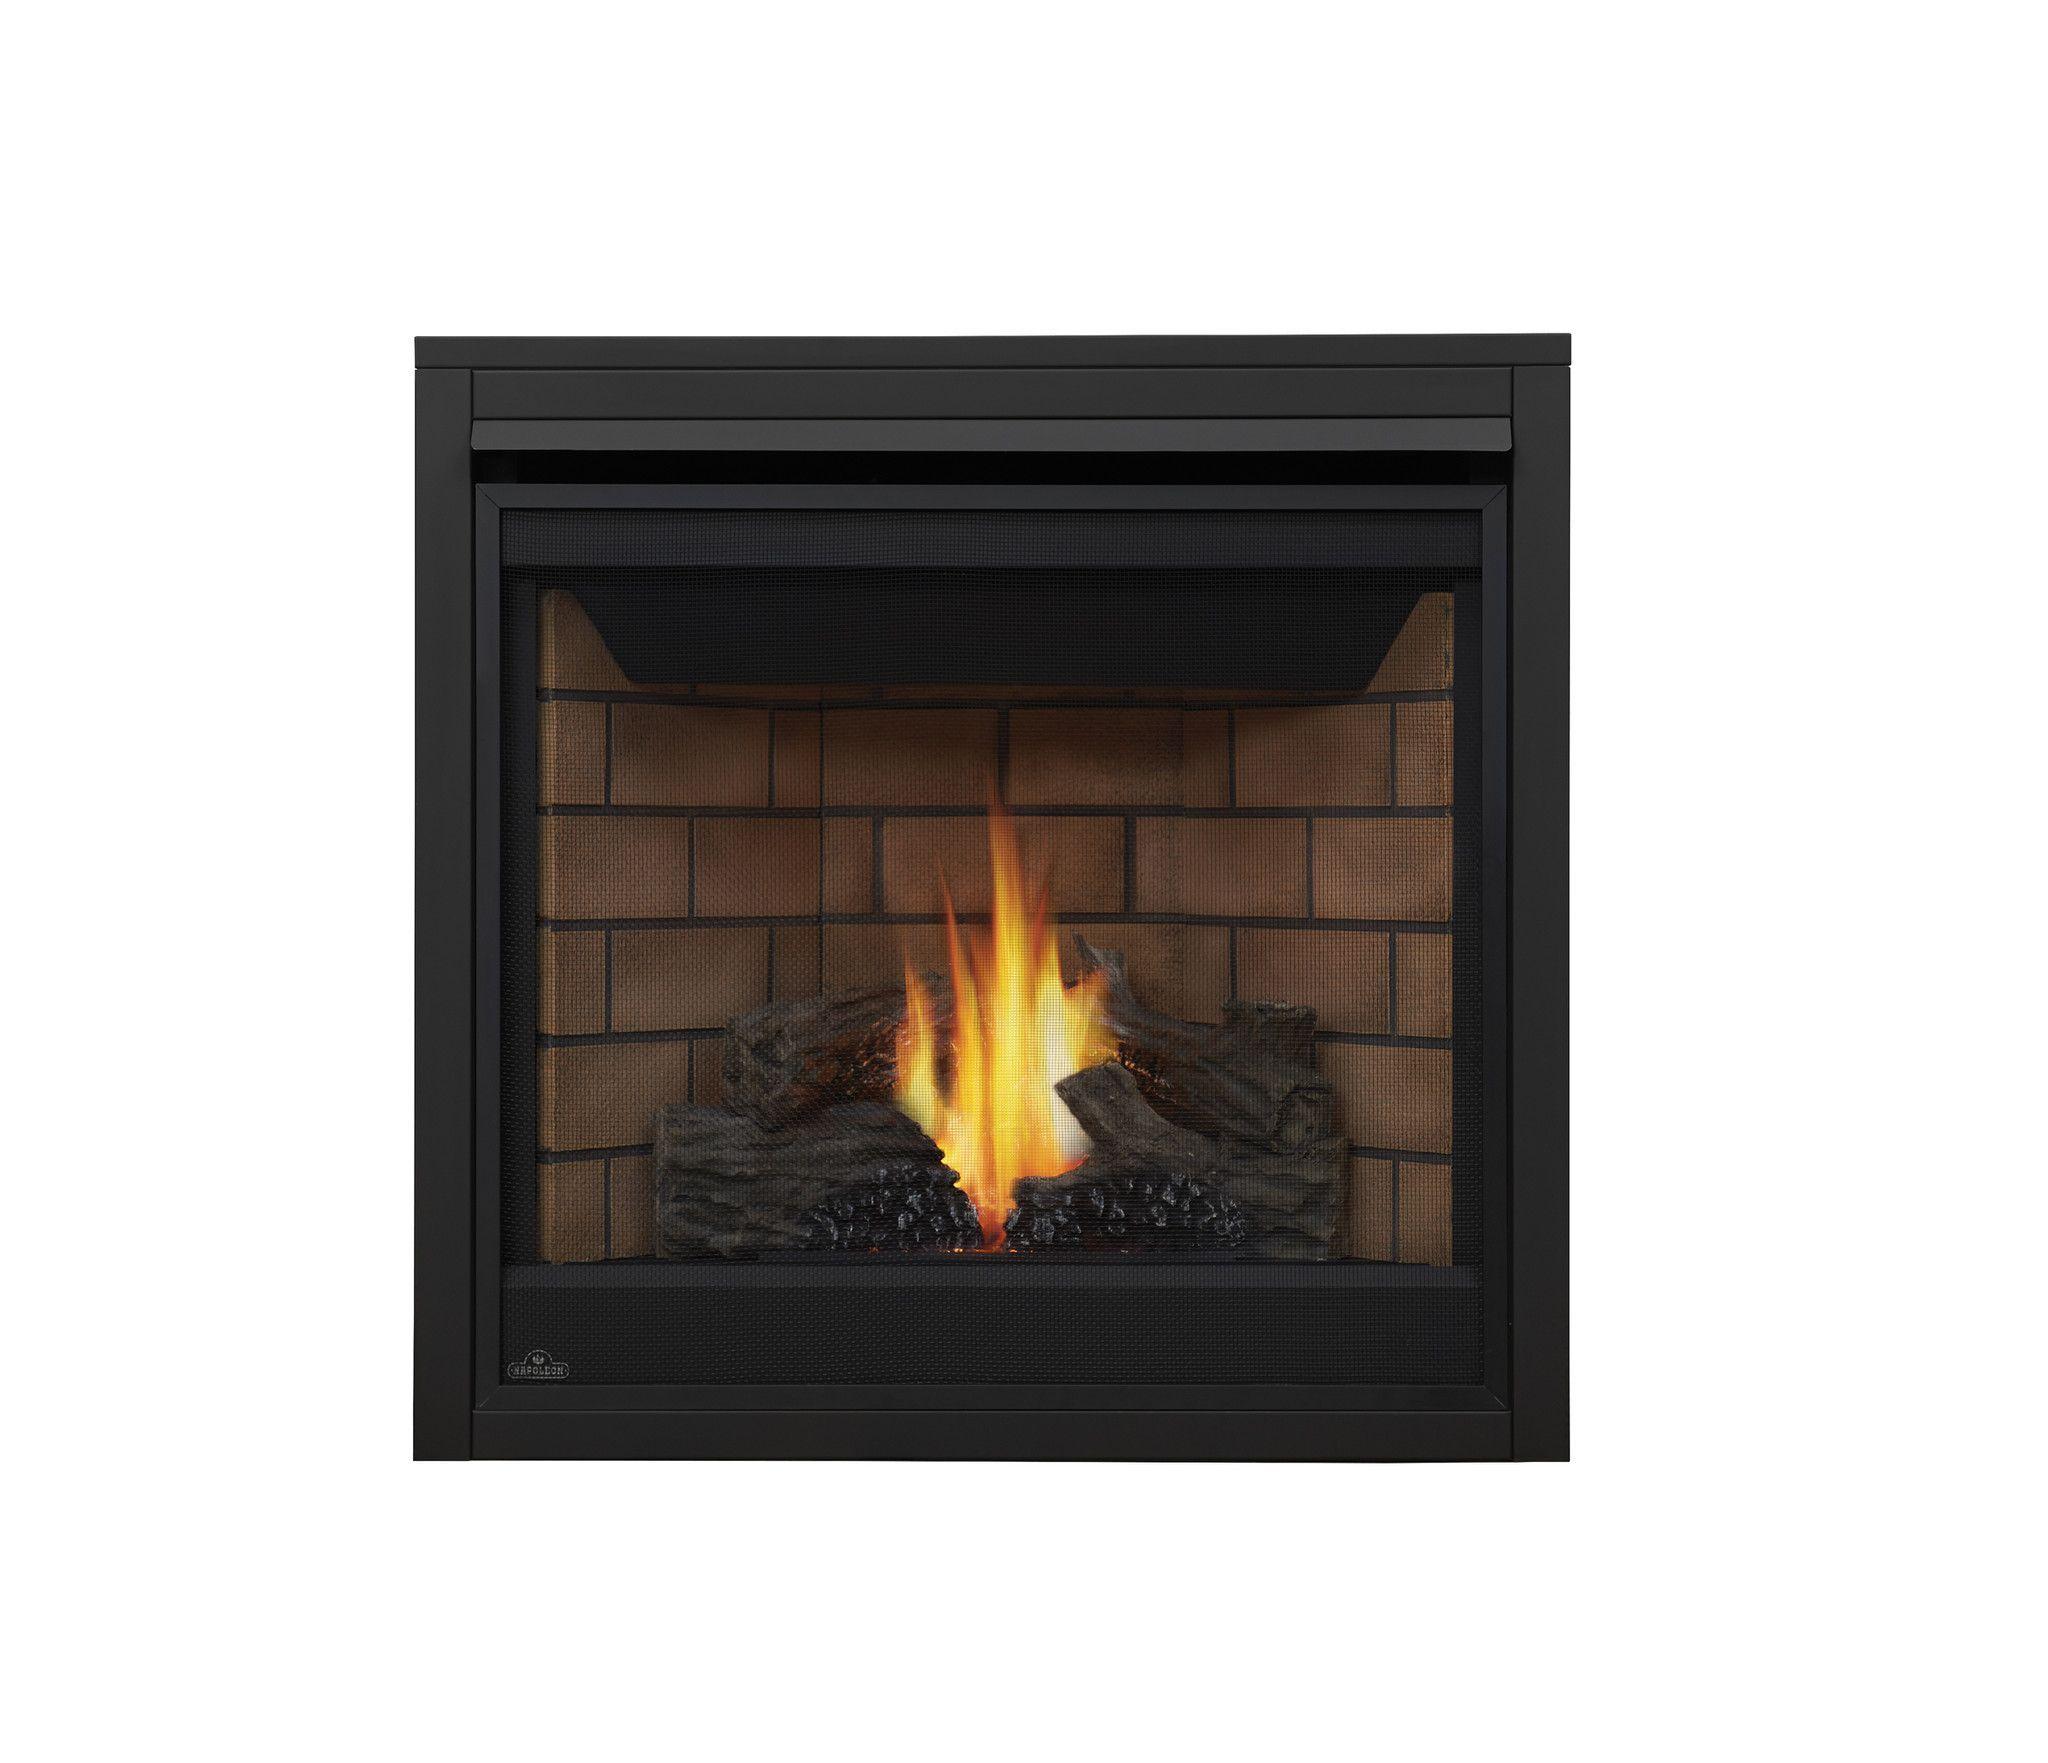 Napoleon Ascent B30 Direct Vent Gas Fireplace Gas Fireplace Fireplace Direct Vent Gas Fireplace